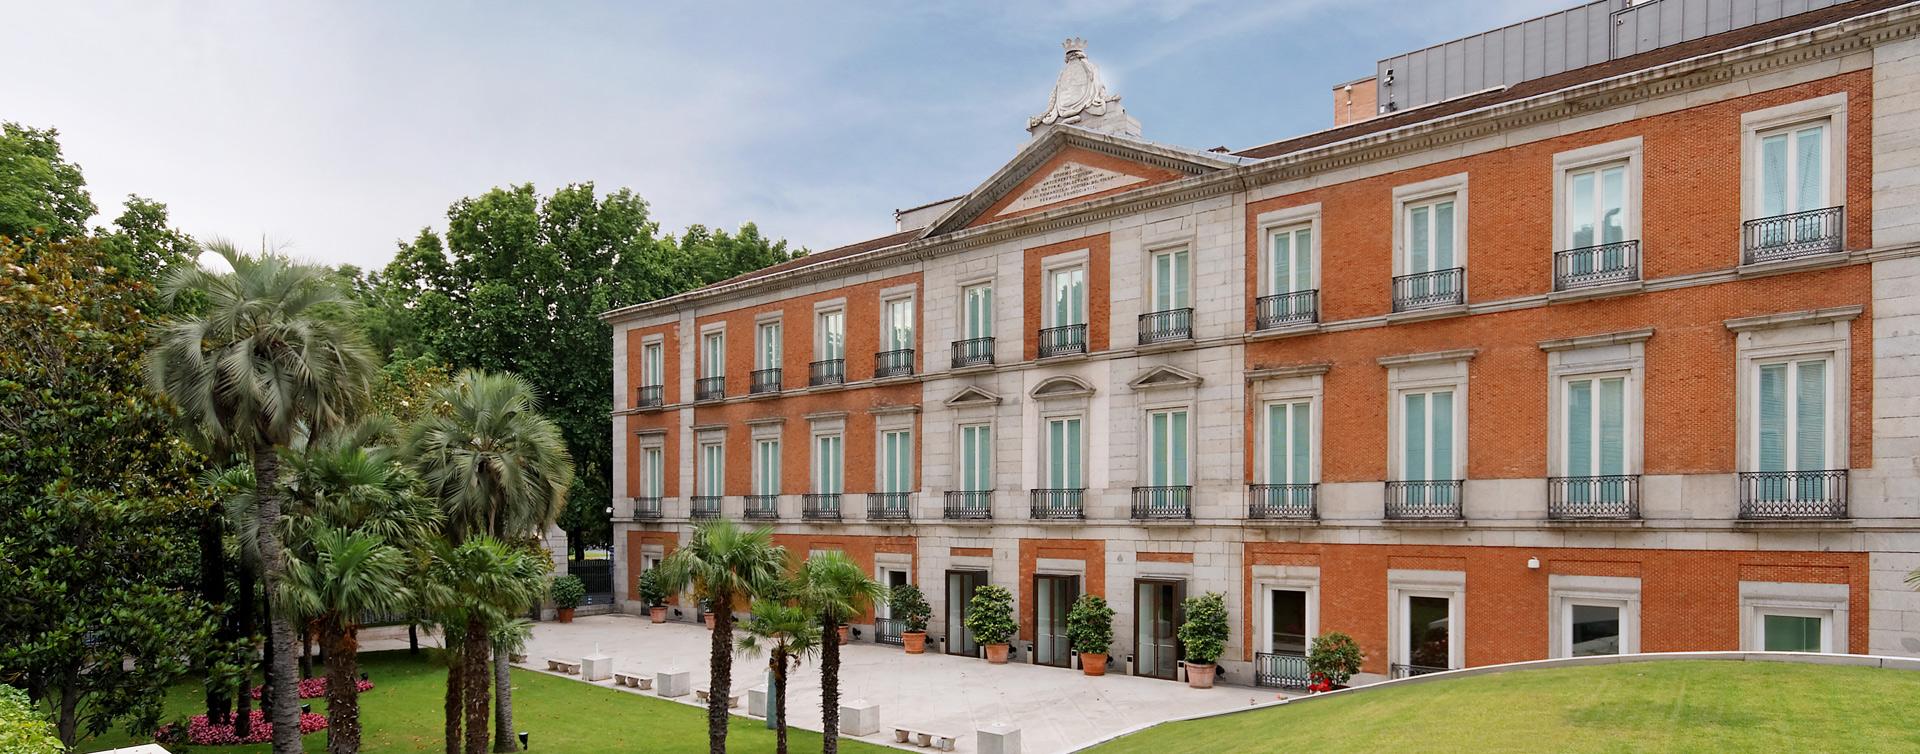 15. MUSEO THYSSEN-BORNEMISZA (MADRID)